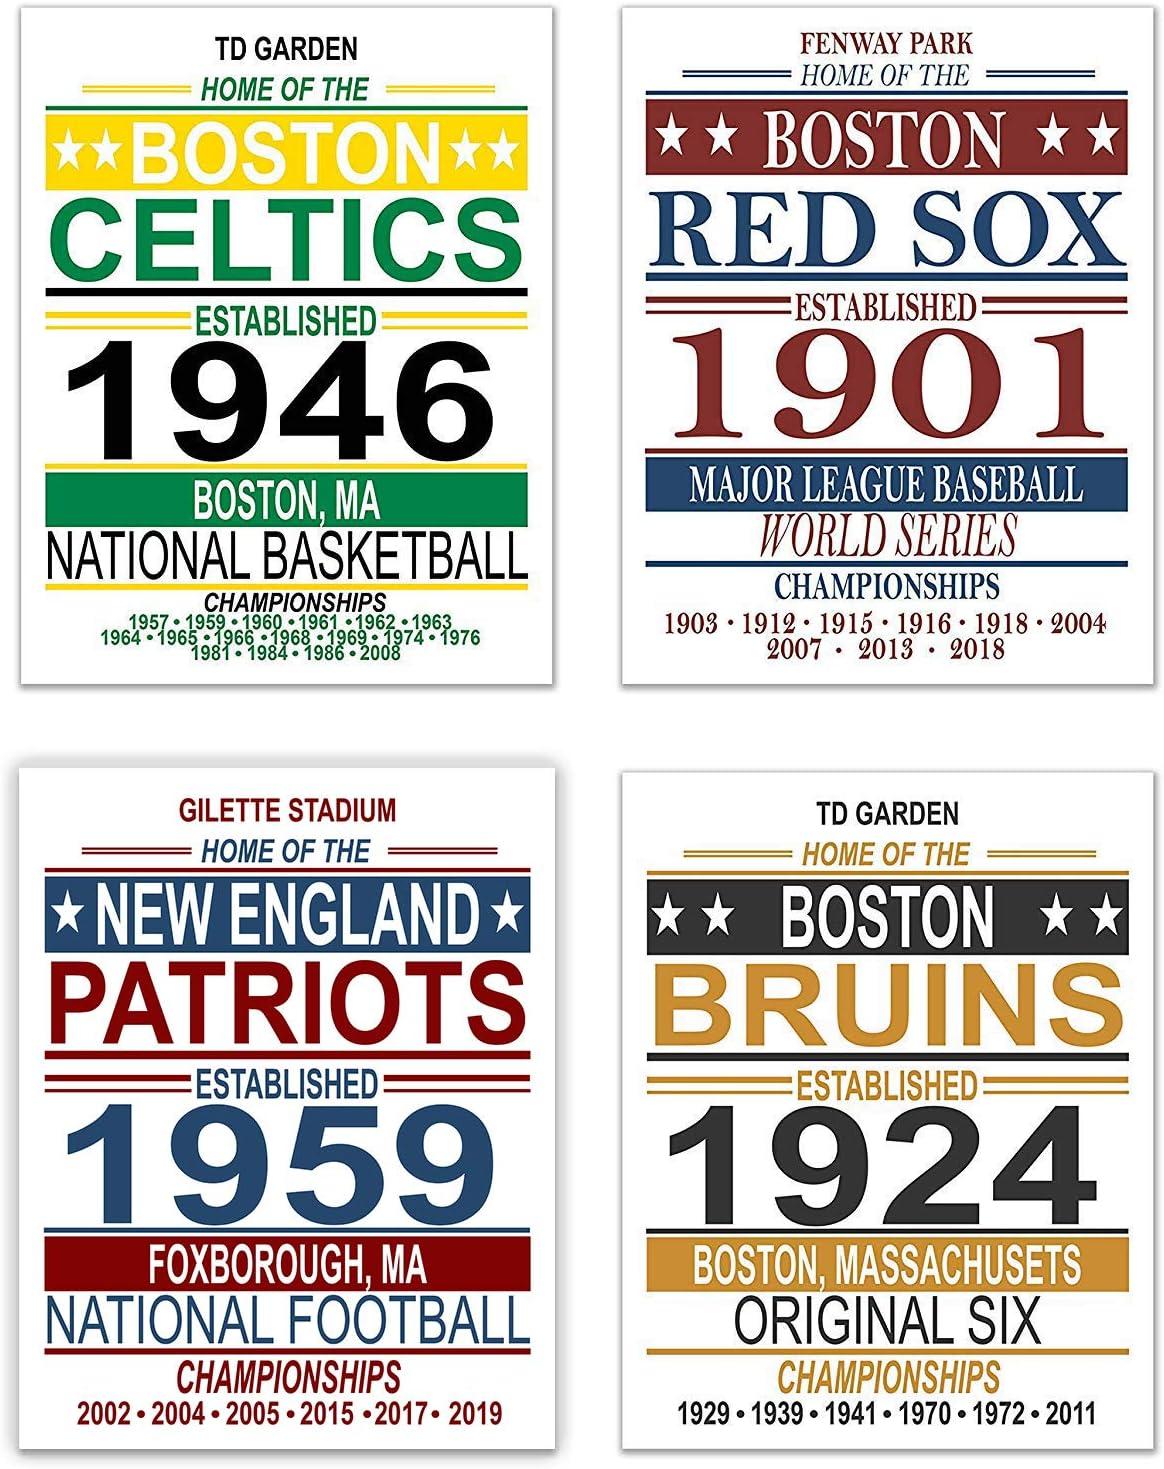 Boston Vintage Sports Posters - Set of Four 11x14 Prints - Celtics, Red Sox, Patriots, Bruins - NBA, MLB, NFL, NHL Memorabilia Fan Art